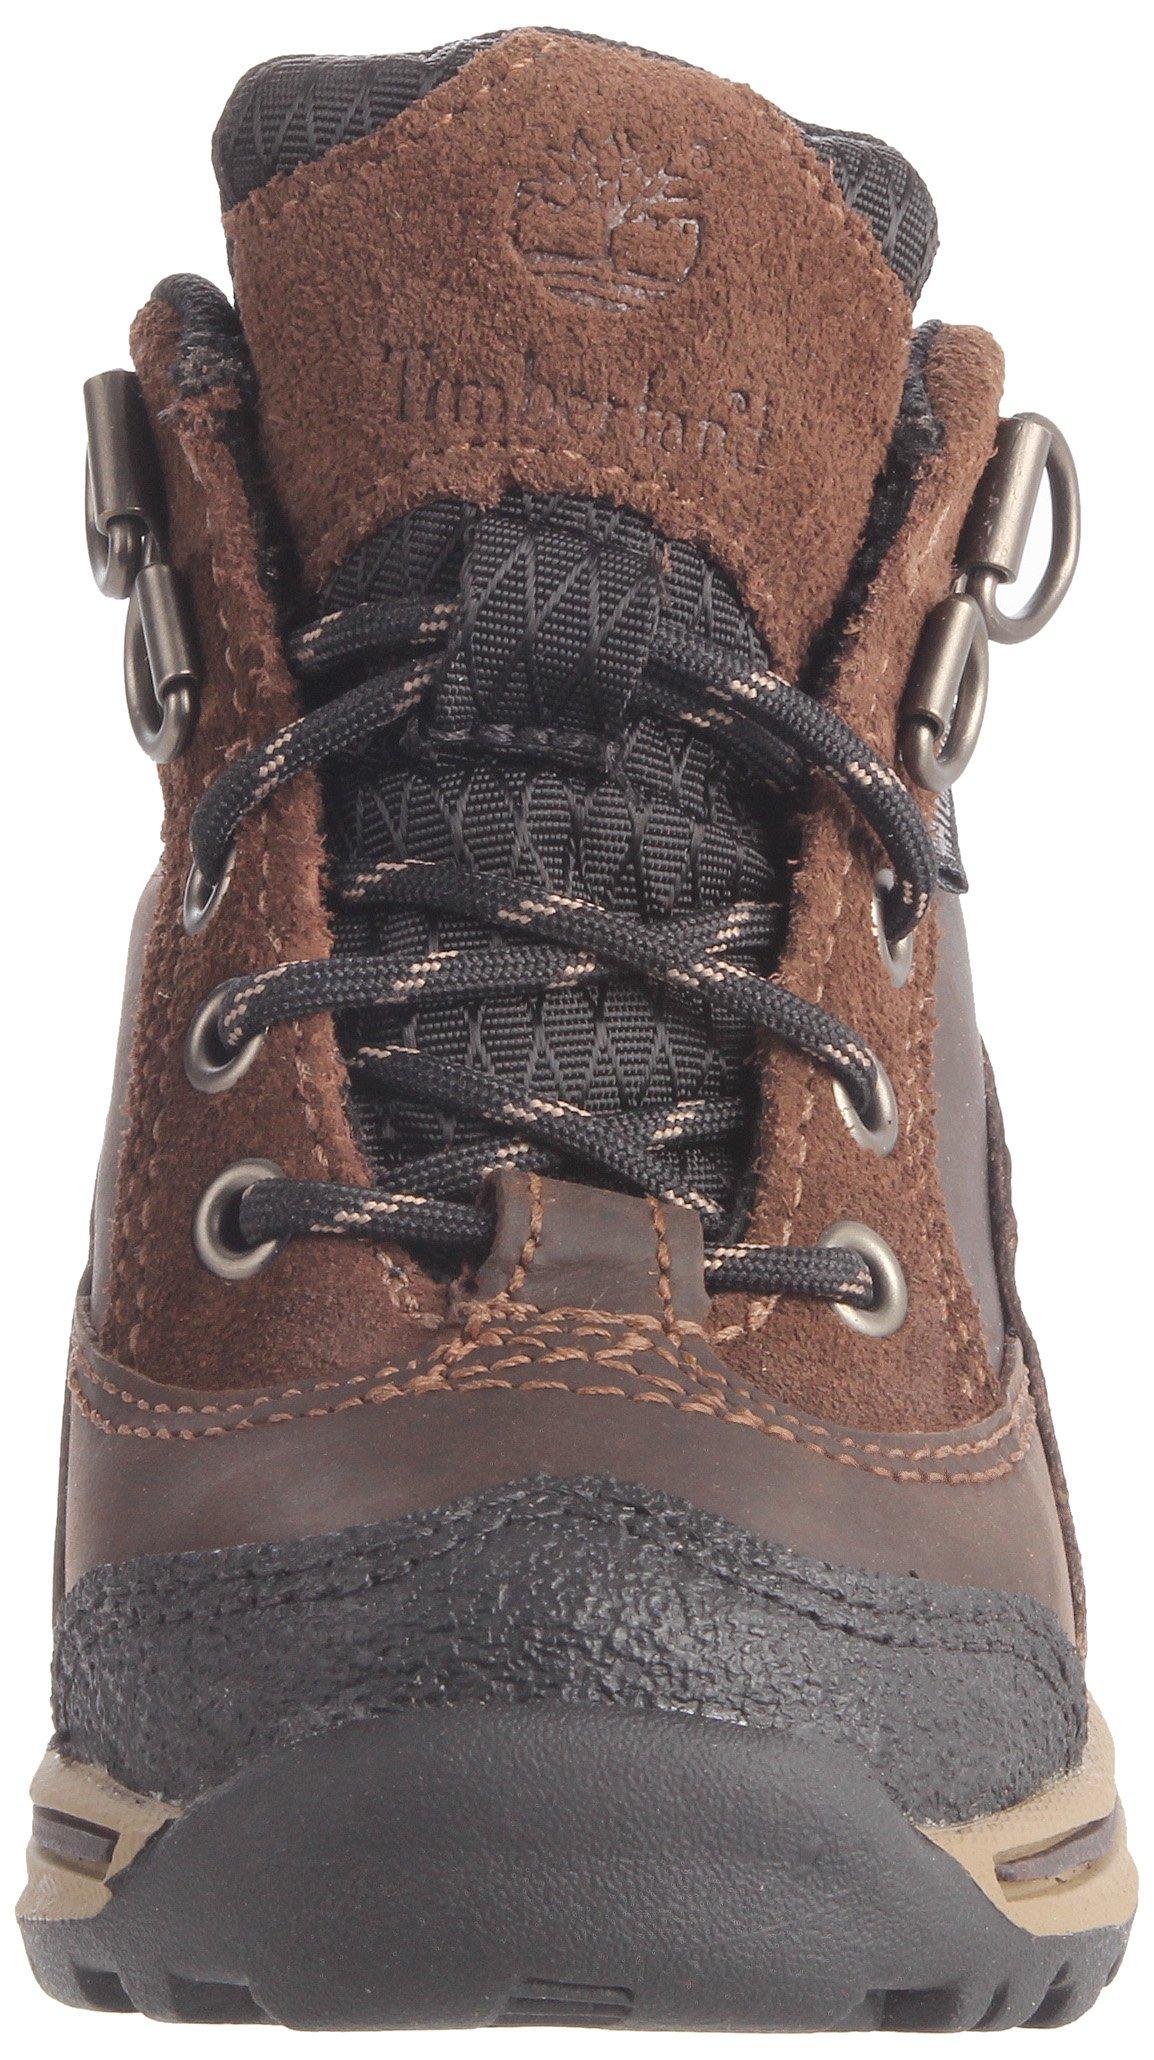 Timberland Pawtuckaway, Unisex-Child Hiking Shoes 4